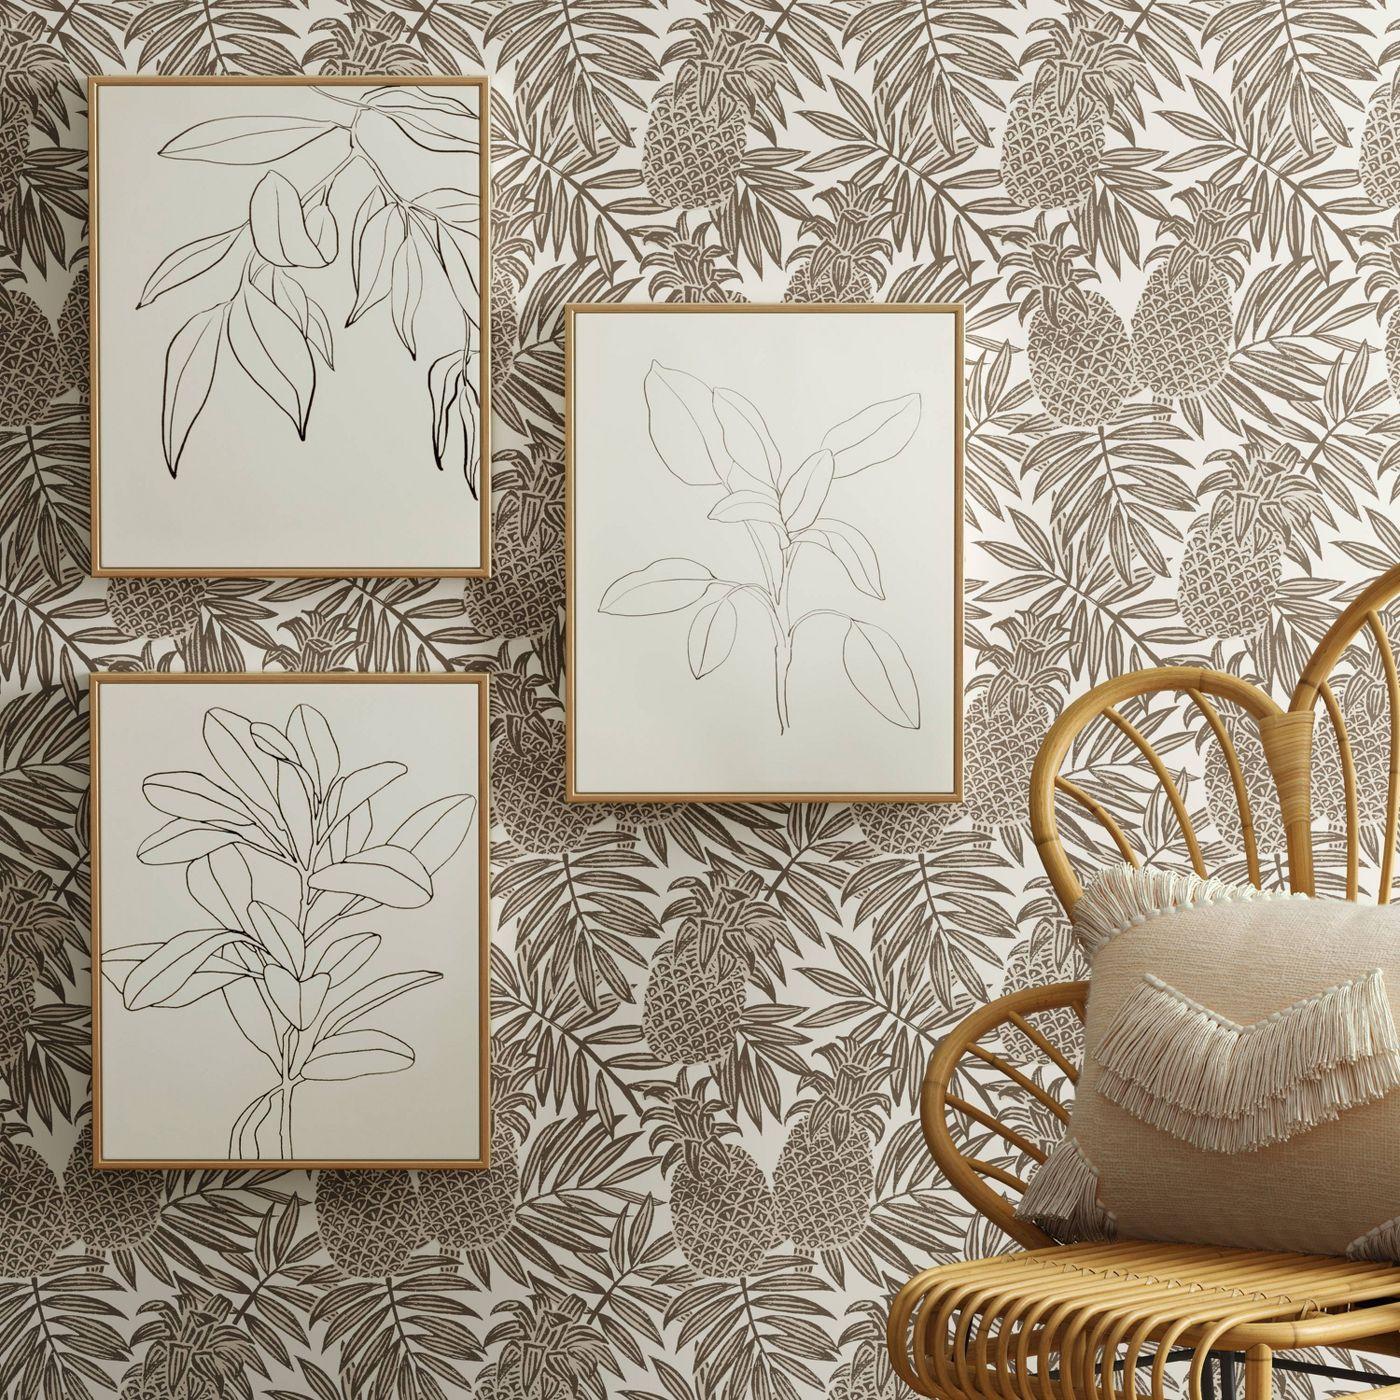 "Set of 3 16"" X 20"" Leaf Illustrations Framed Wall Canvas - Opalhouse™ - image 2 of 6"